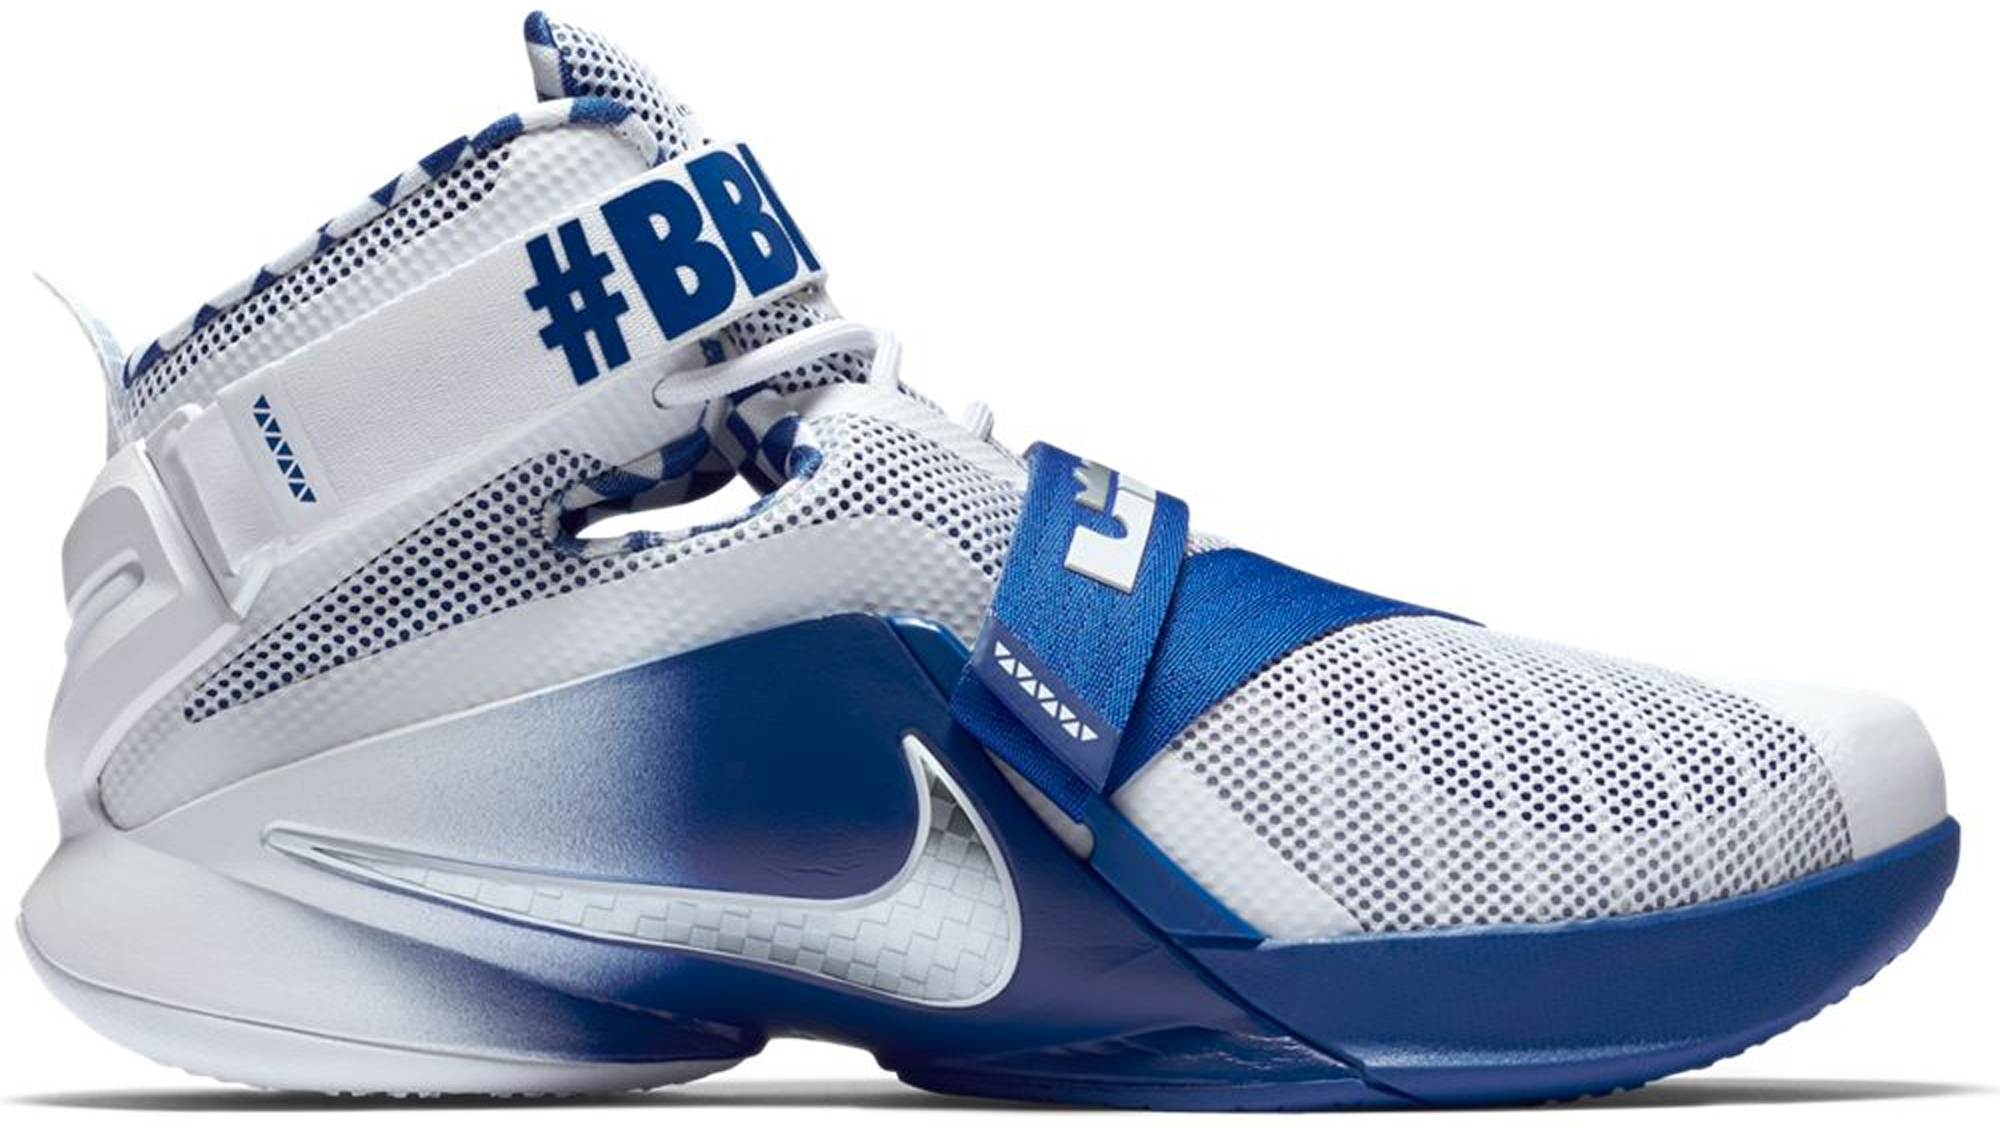 Nike LeBron Soldier 9 Kentucky - 749490-104